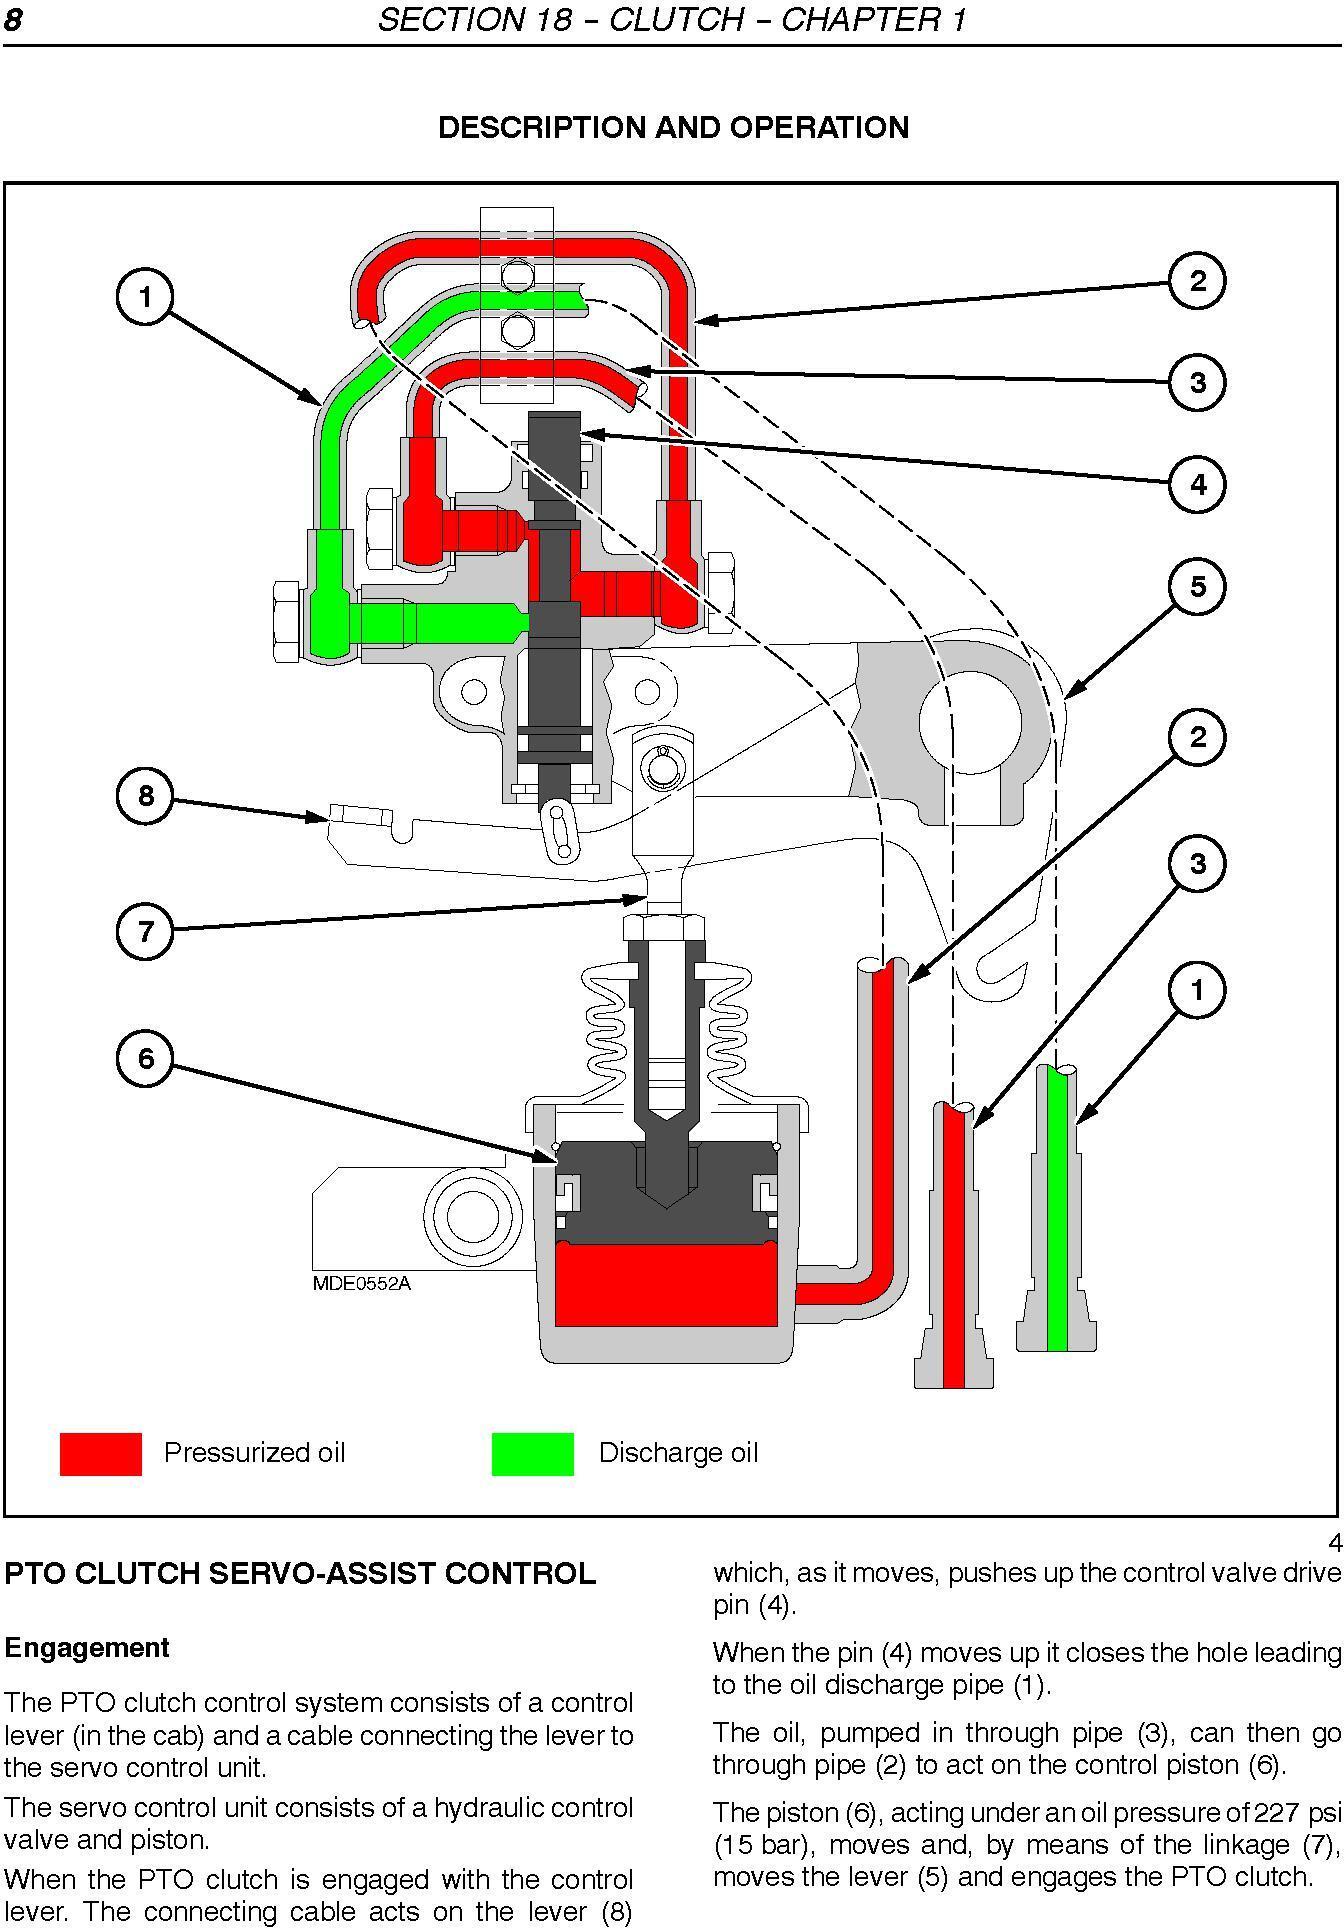 New Holland TN60A, TN70A, TN75A, TN85A, TN95A Tractors Complete Service Manual - 2